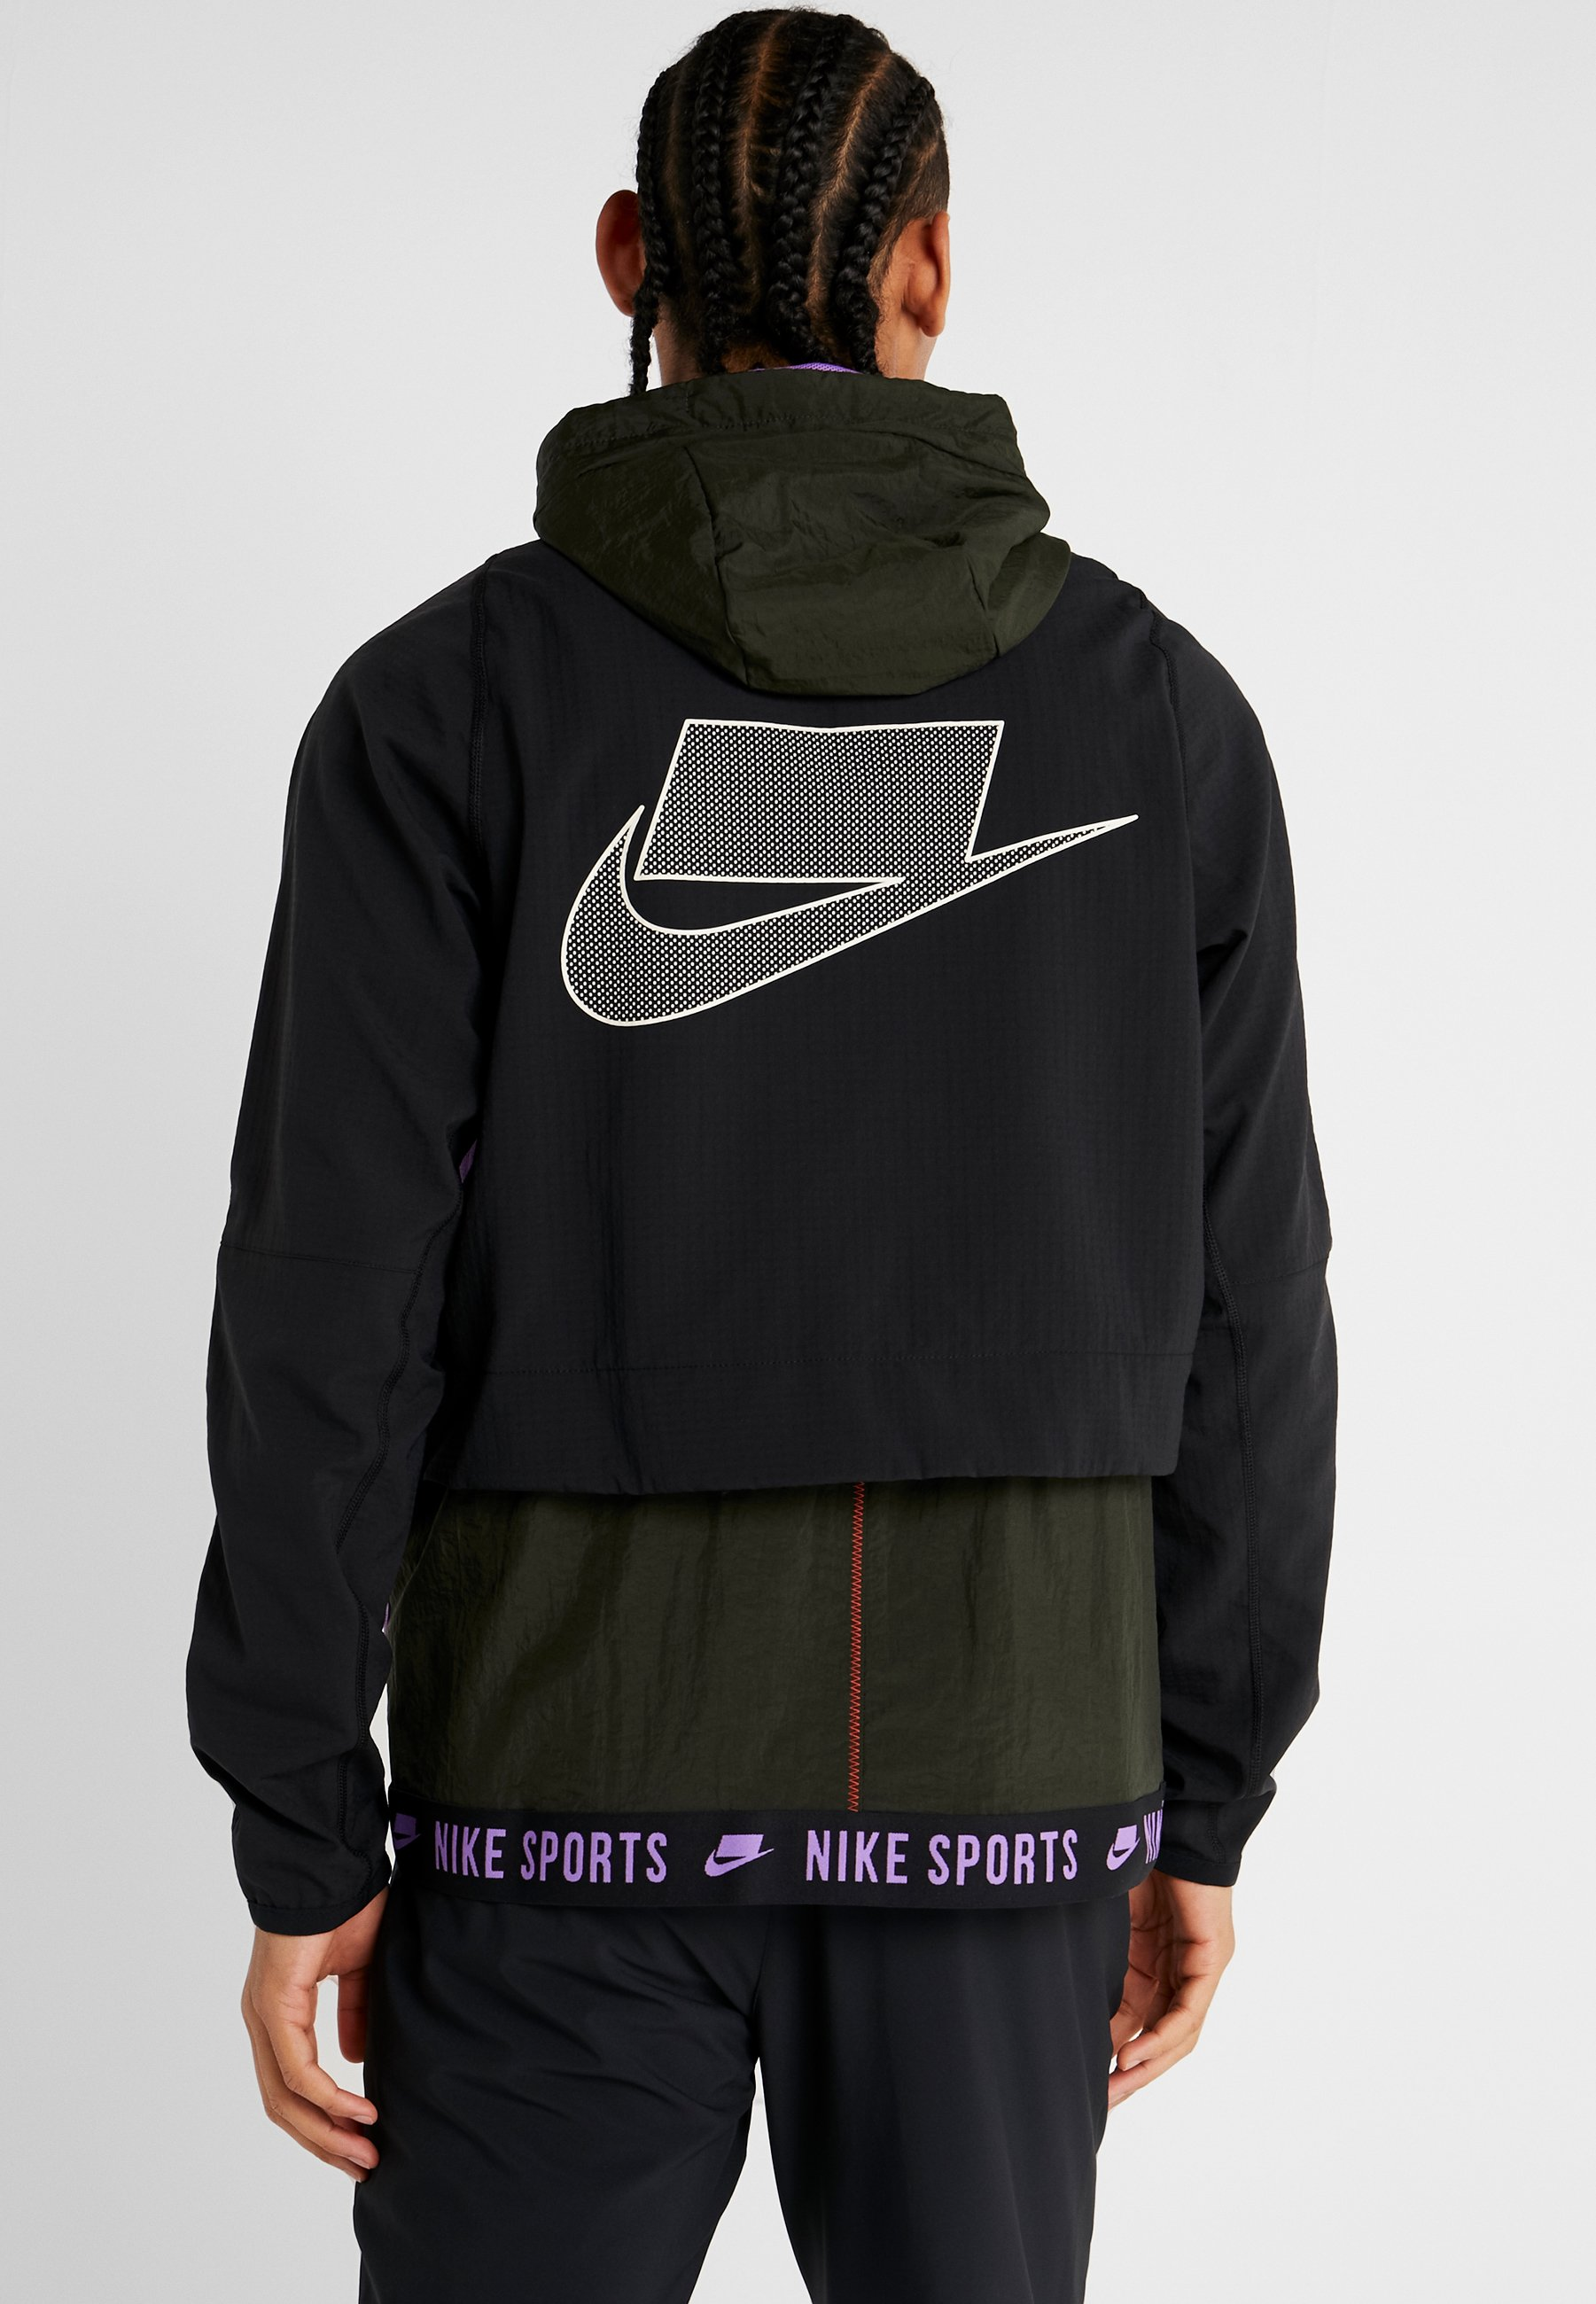 FlexGiacca black bright Nike Sportiva Sequoia Ivory Violet pale Performance kX8n0PwO